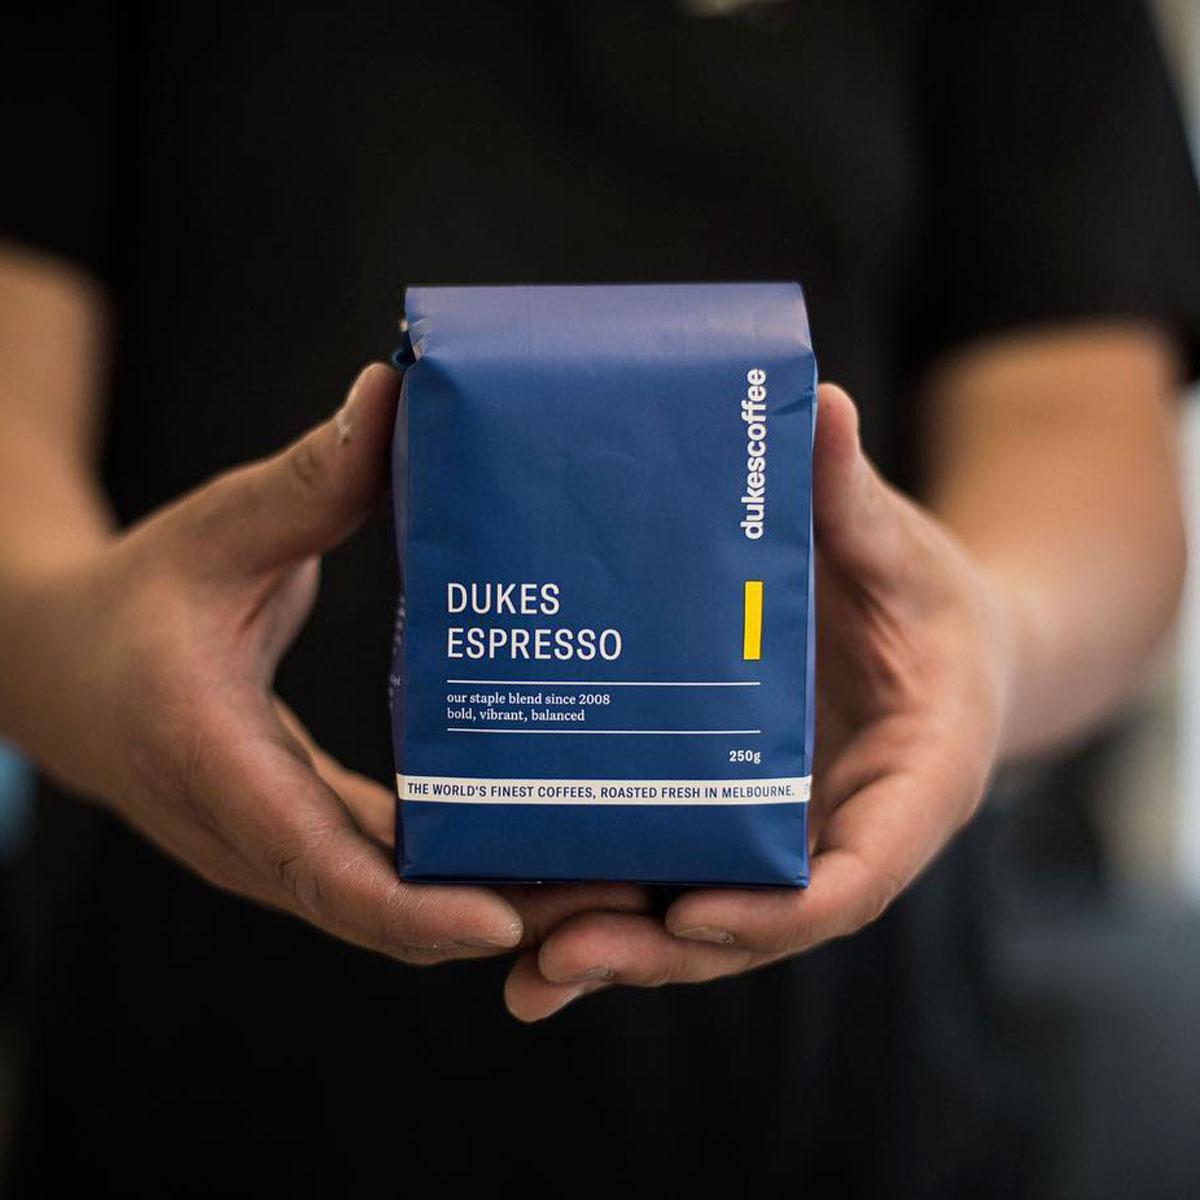 Dukes Espresso Blend 250g